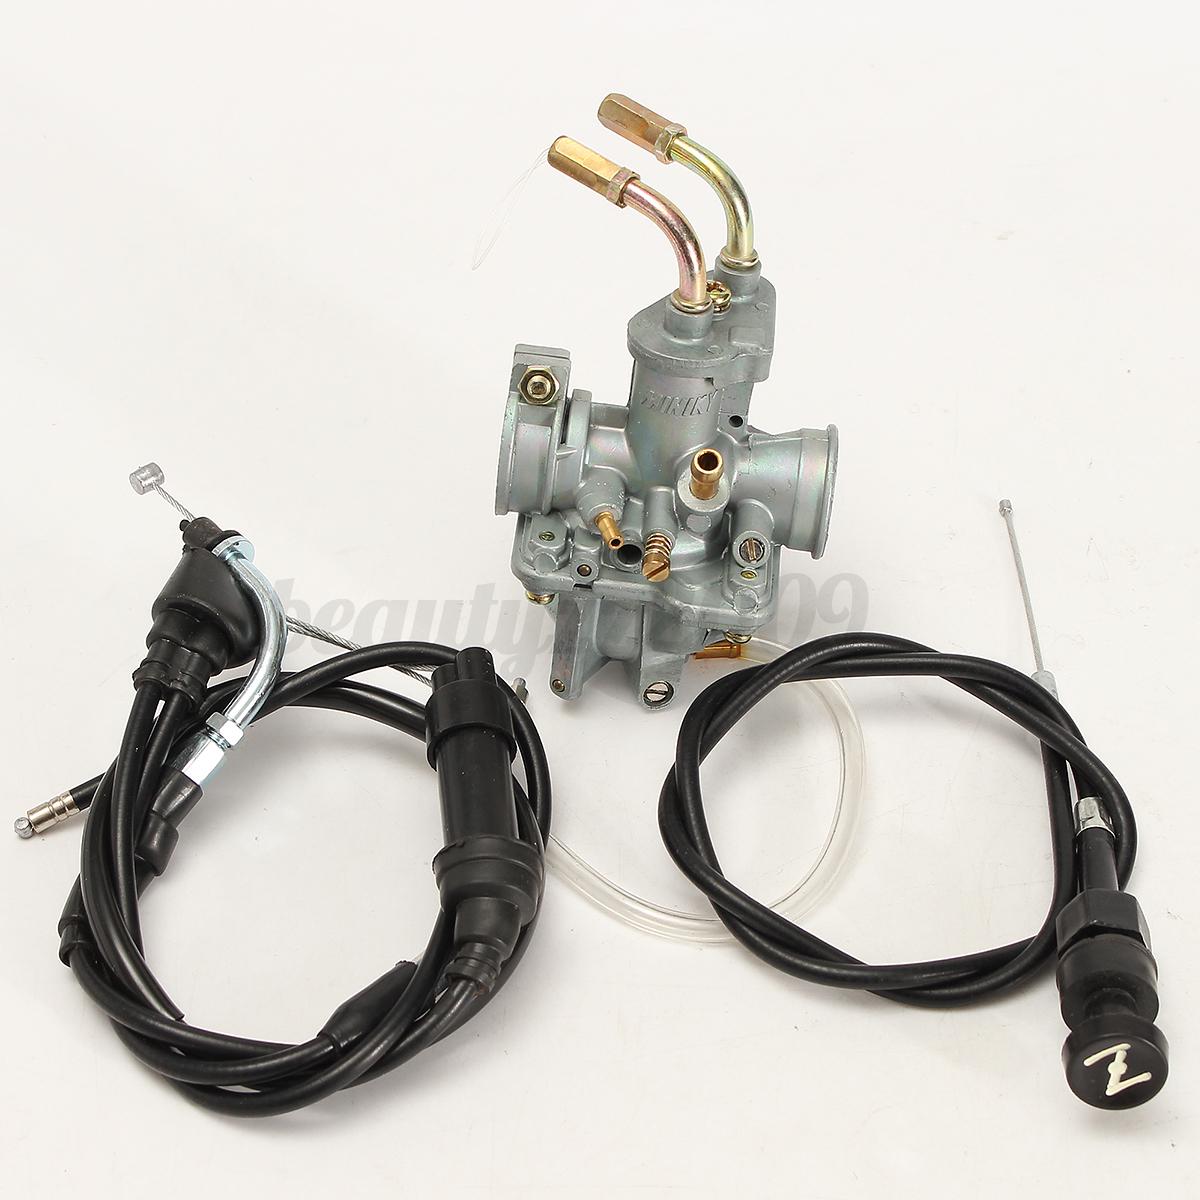 yamaha pw50 carburetor adjustment